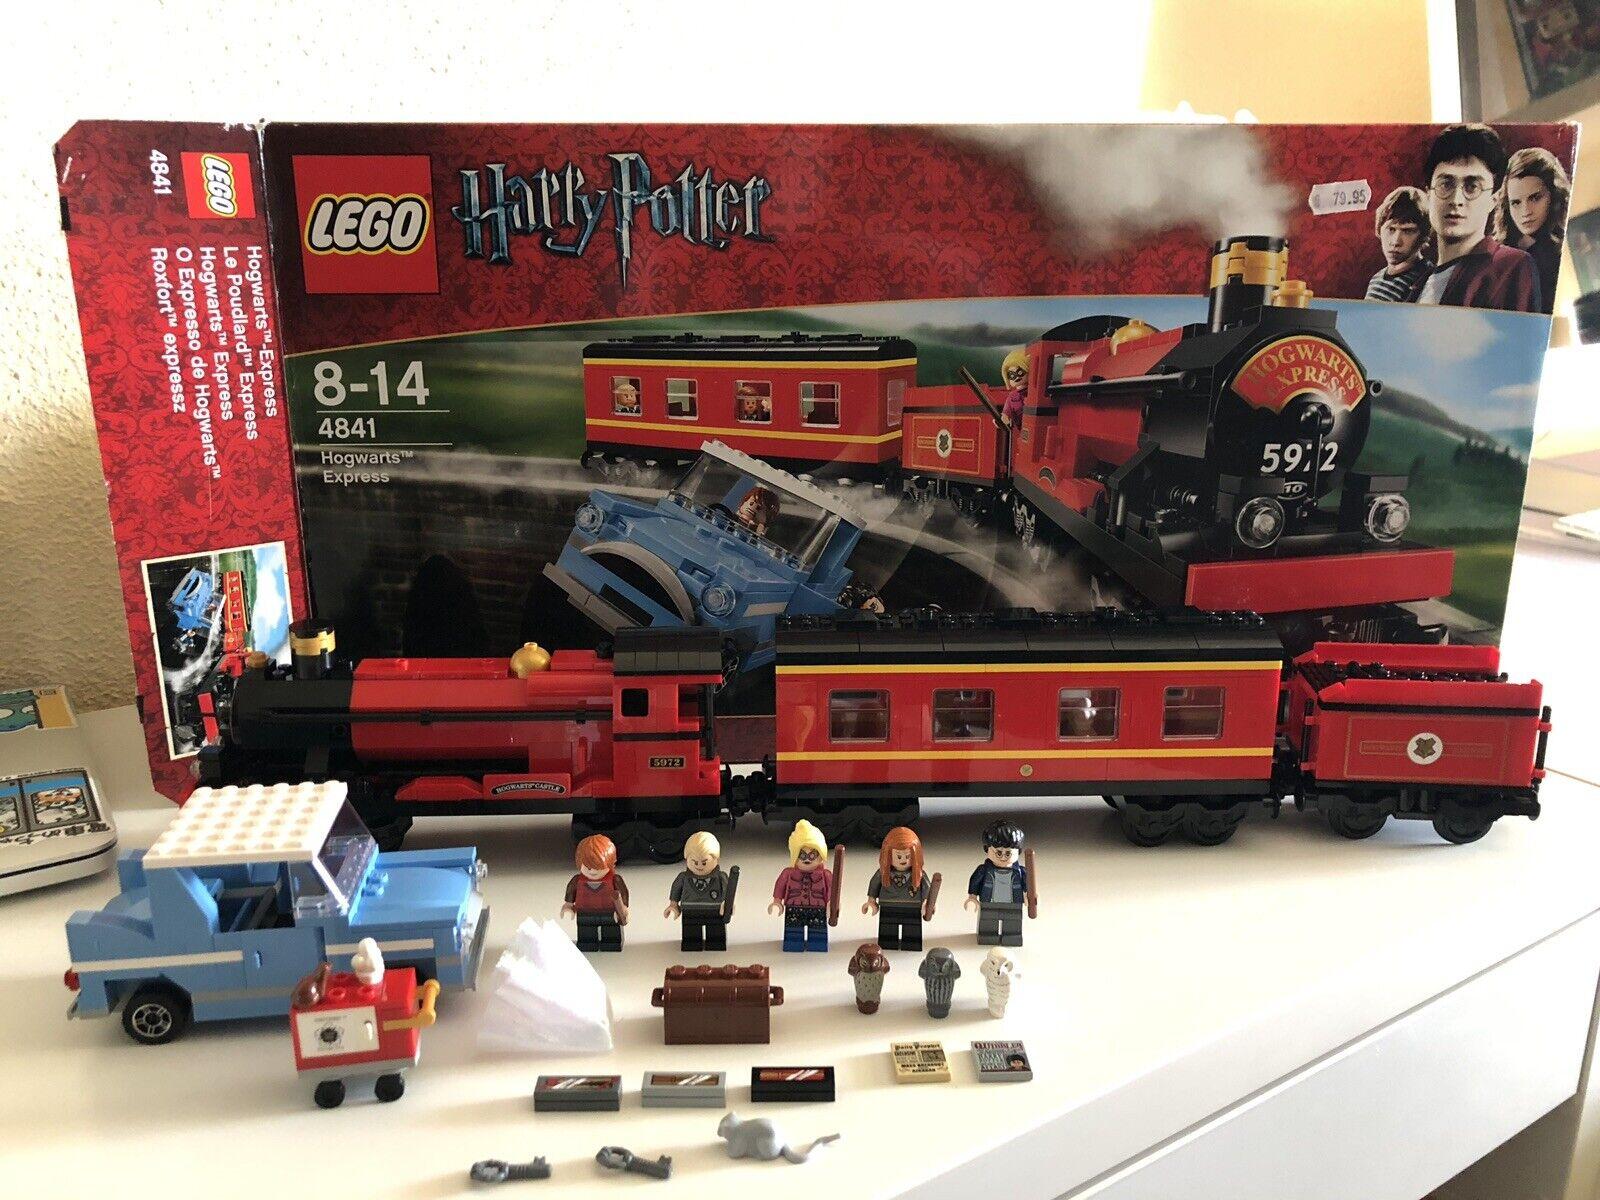 presa di fabbrica Lego Harry Potter 4841 Hogwarts Express Express Express completare  negozio d'offerta